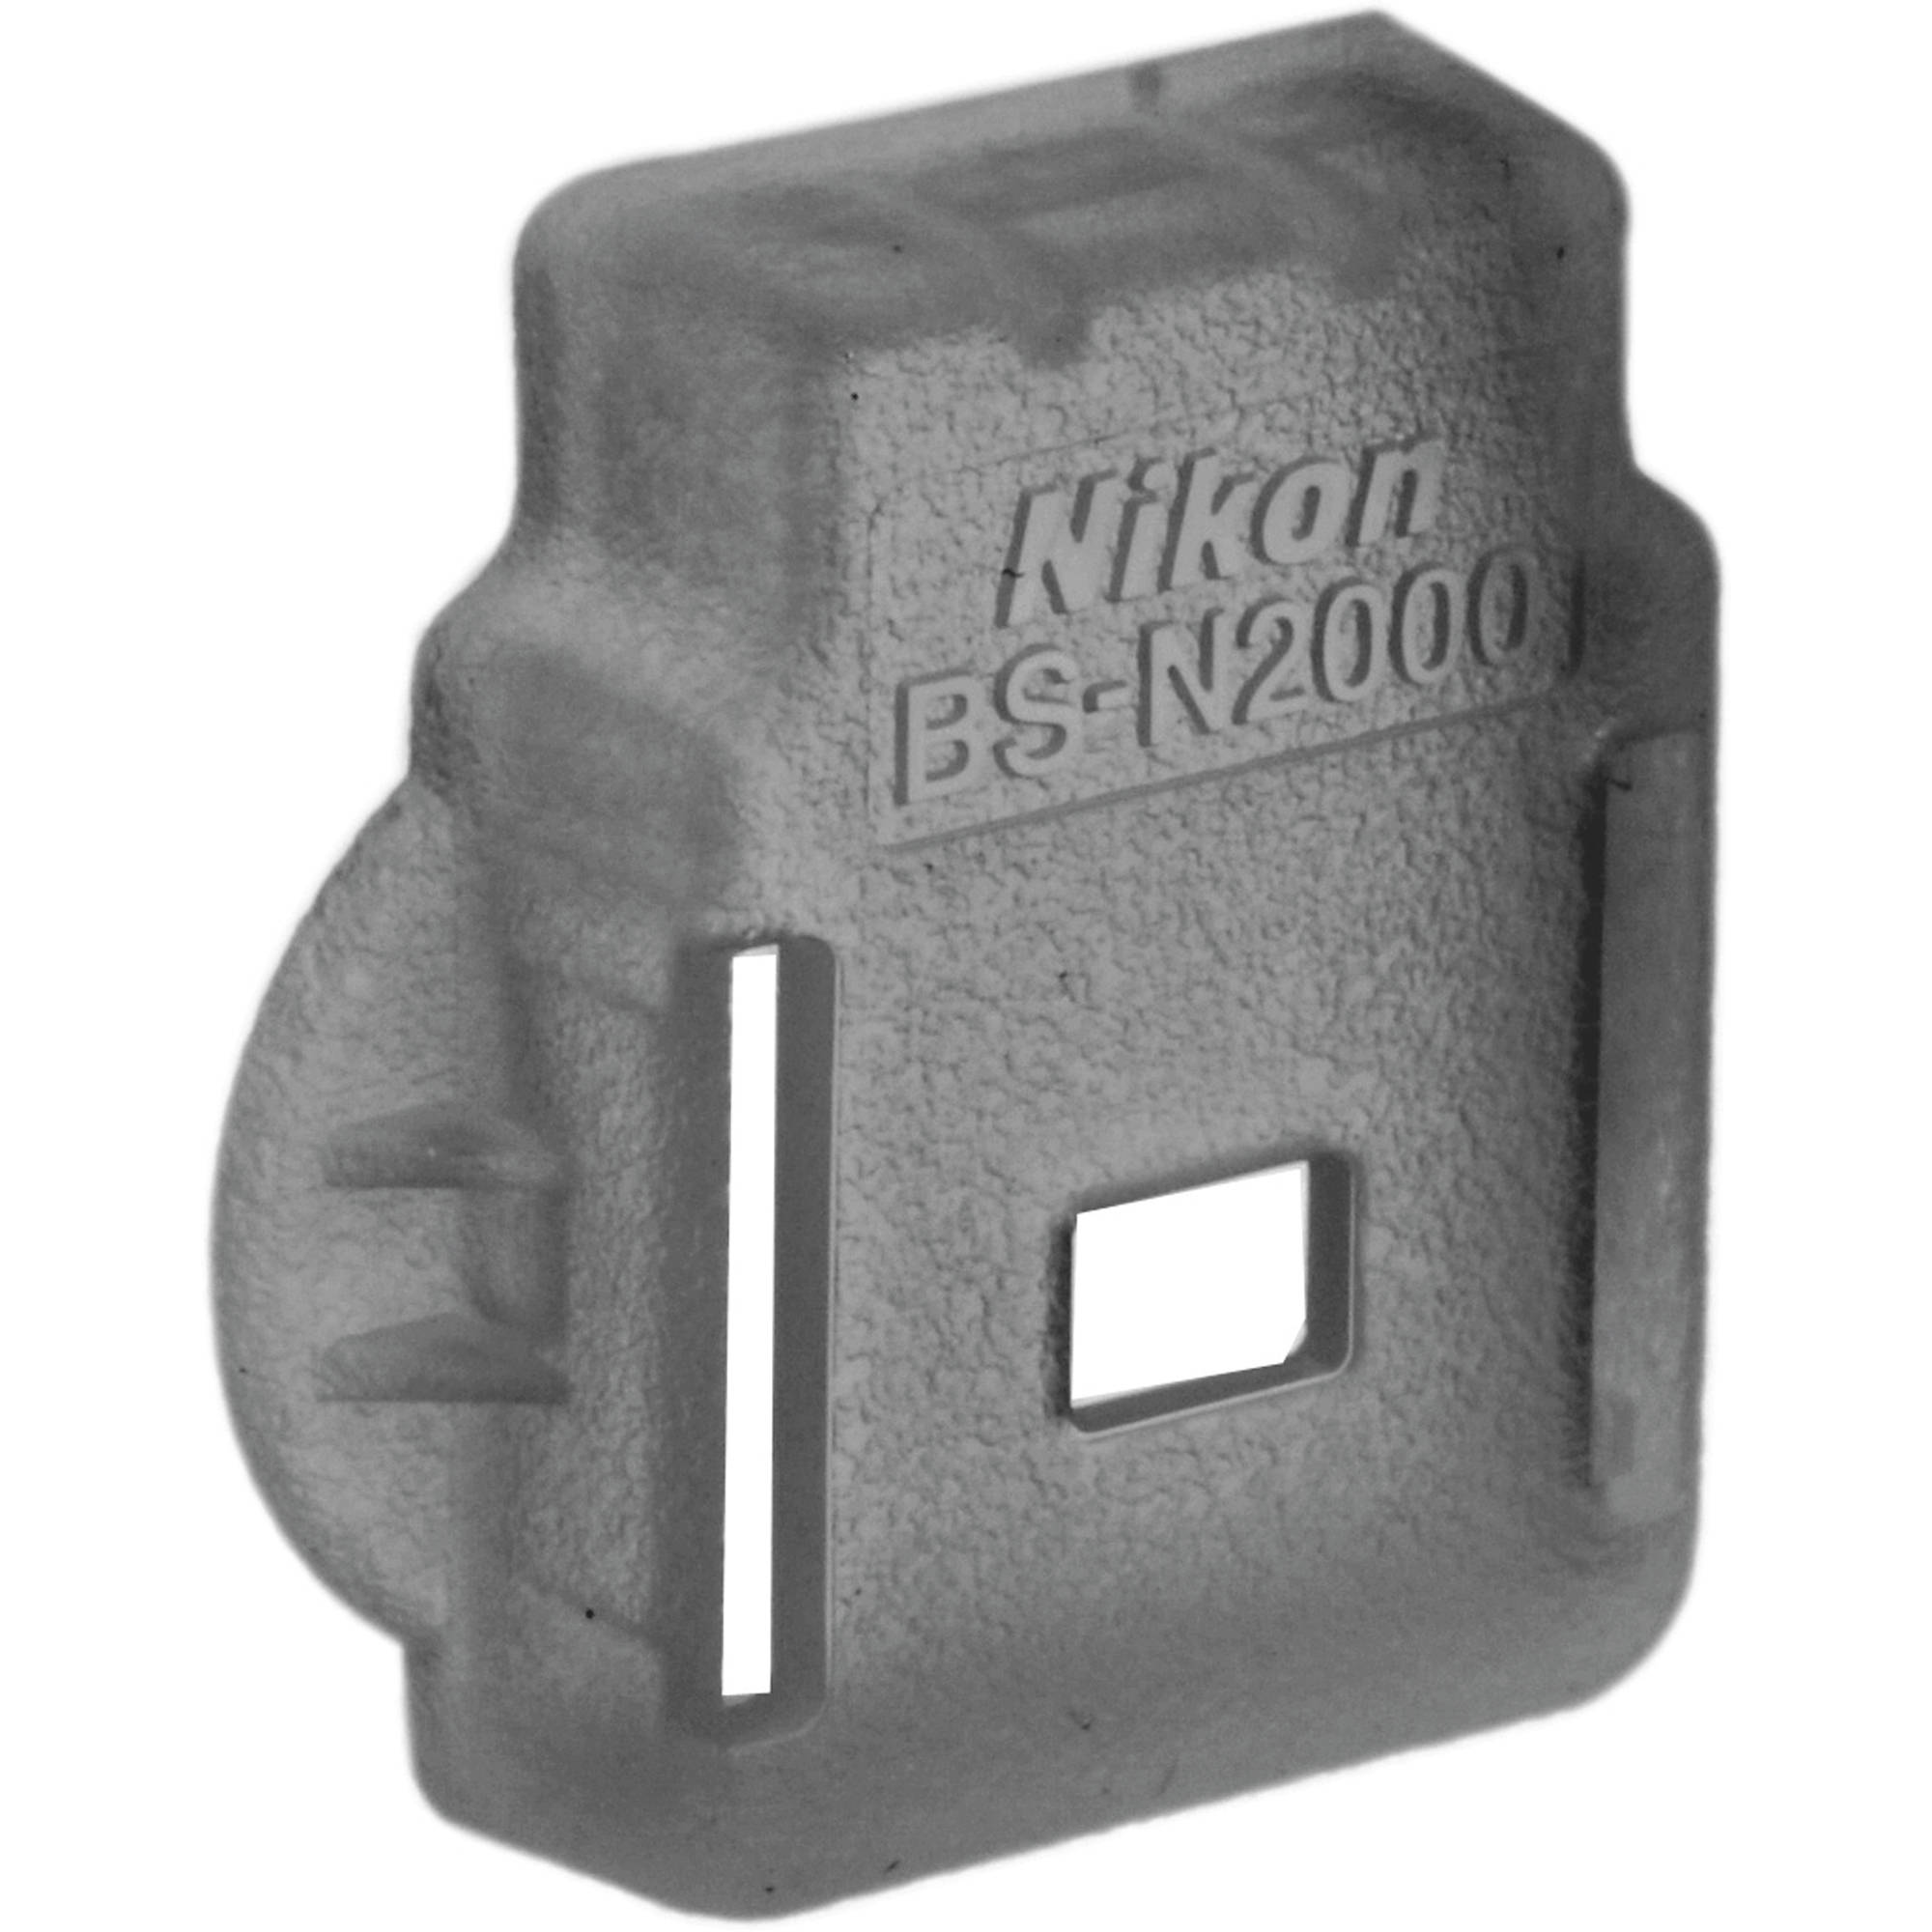 BS-N2000 copri contatti SB-N5